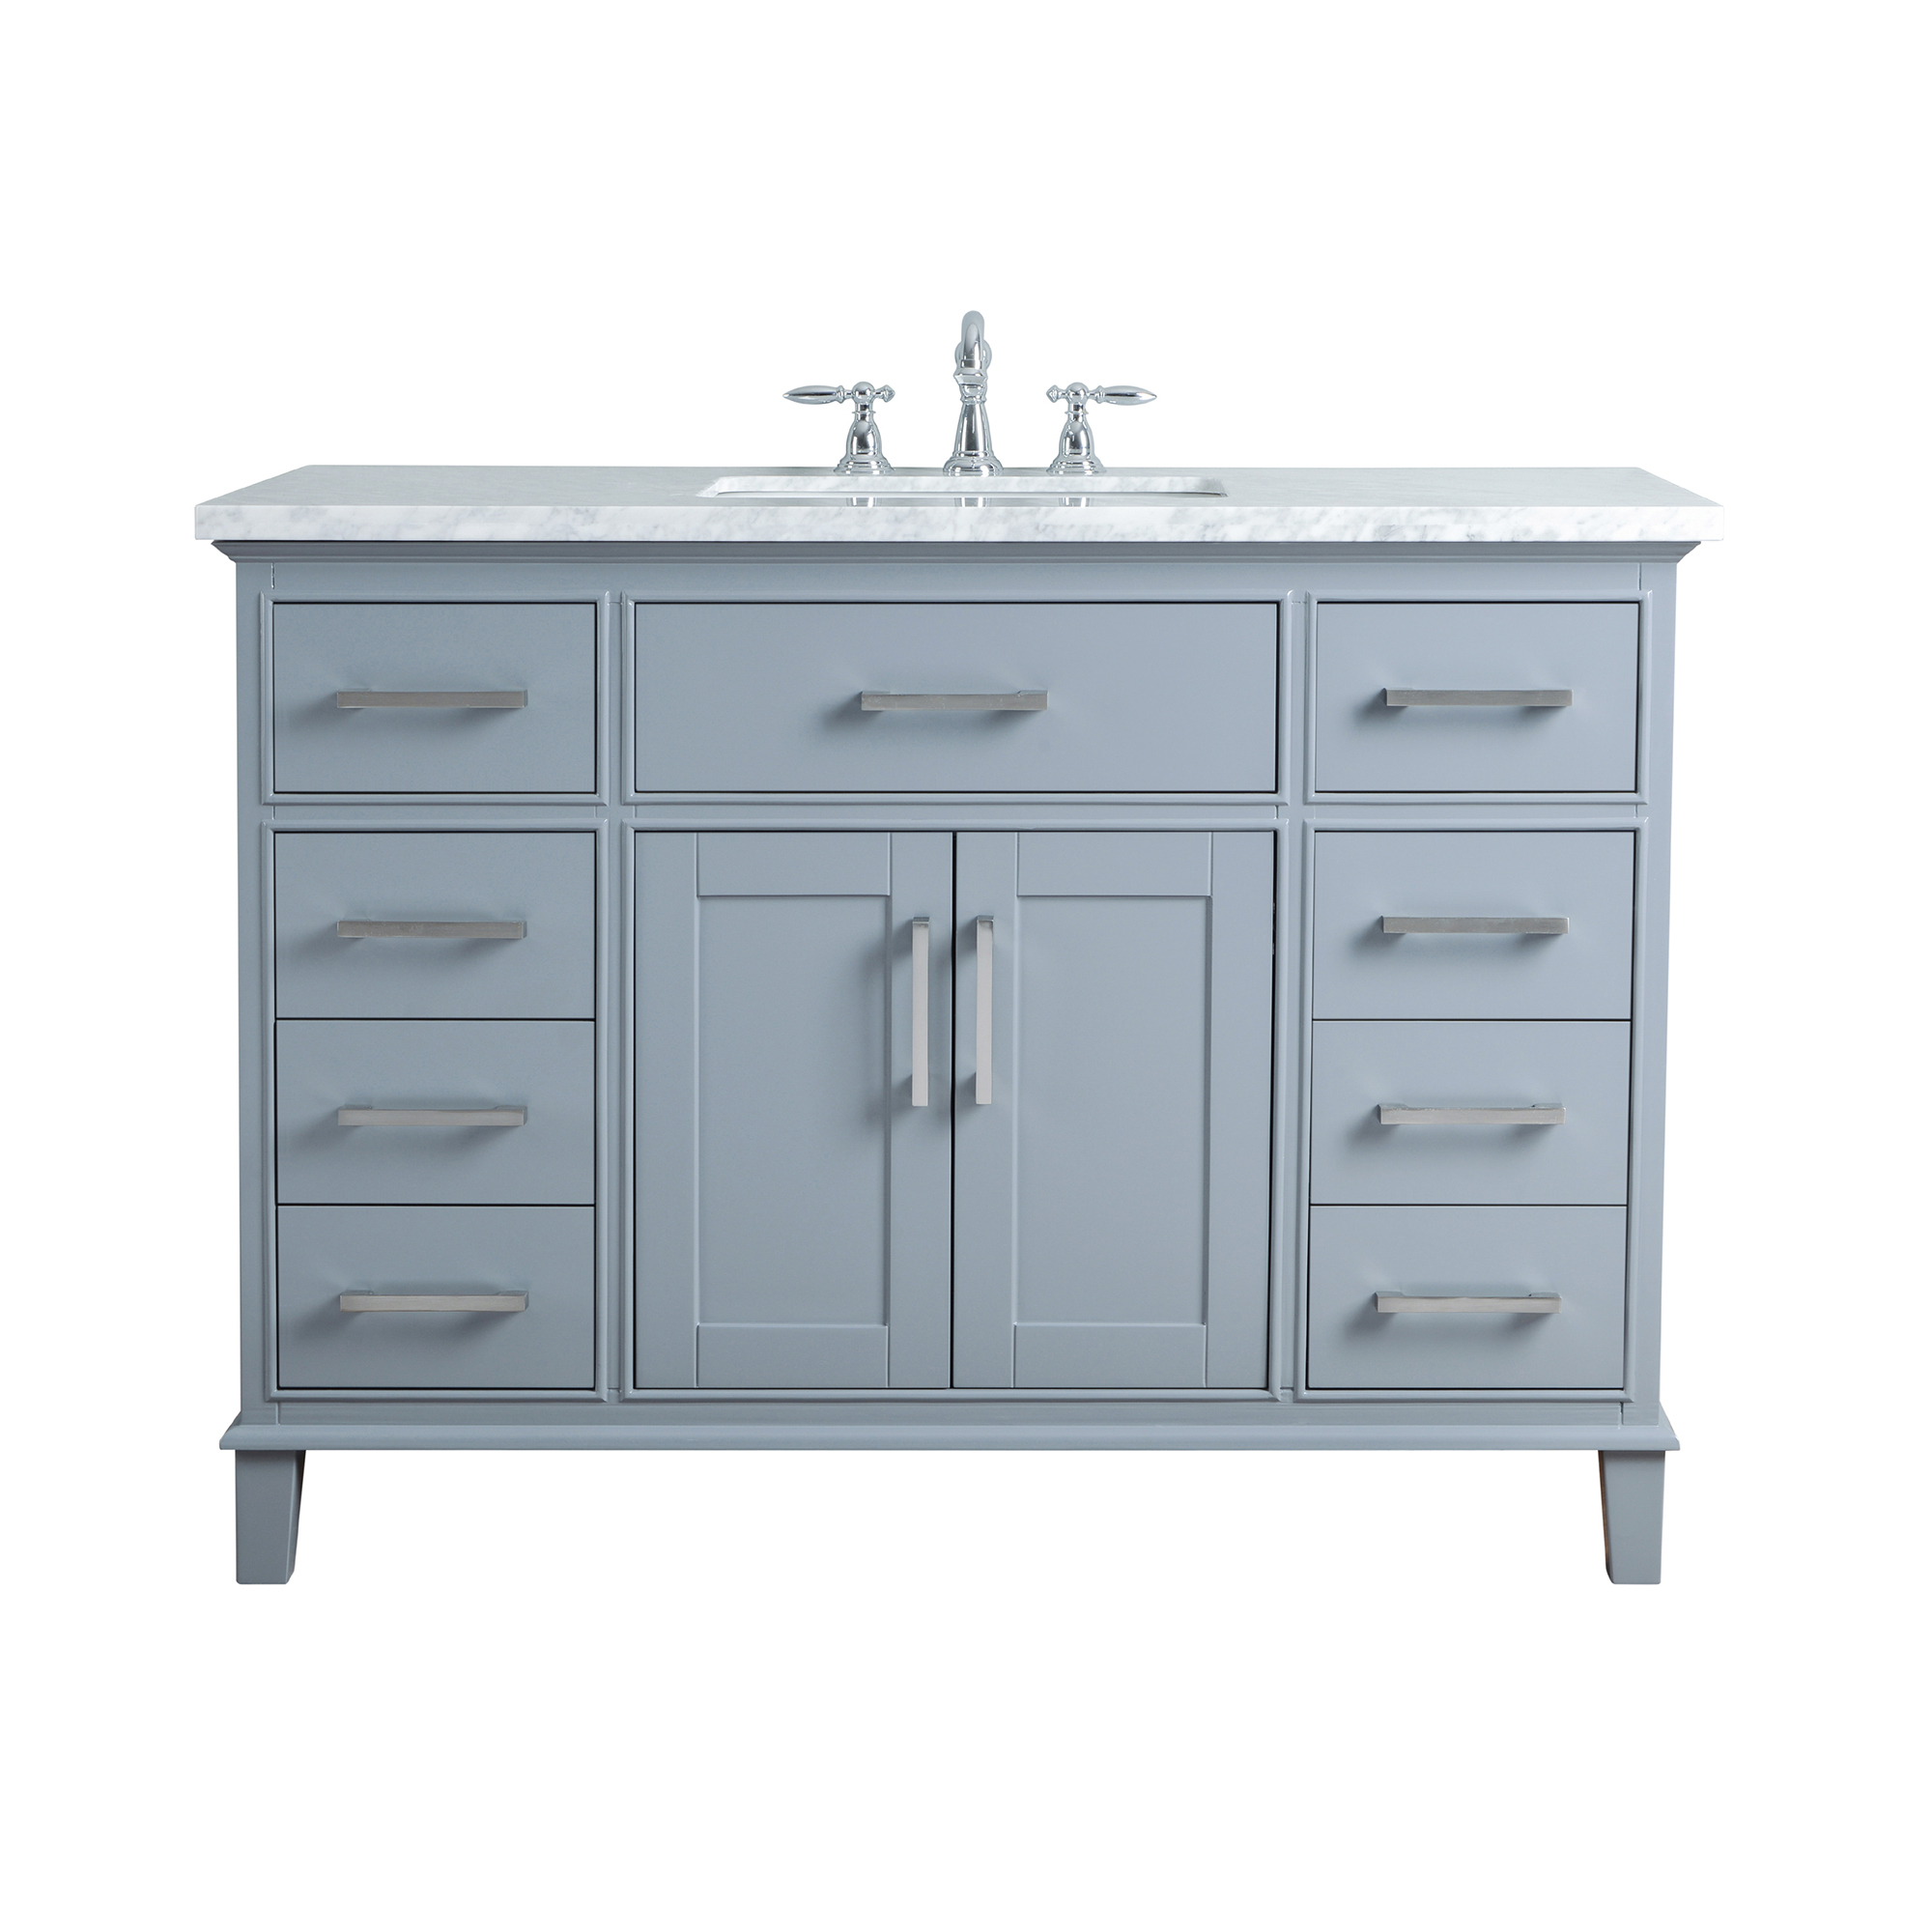 Leigh 48-inch Single Sink Bathroom Vanity - Grey